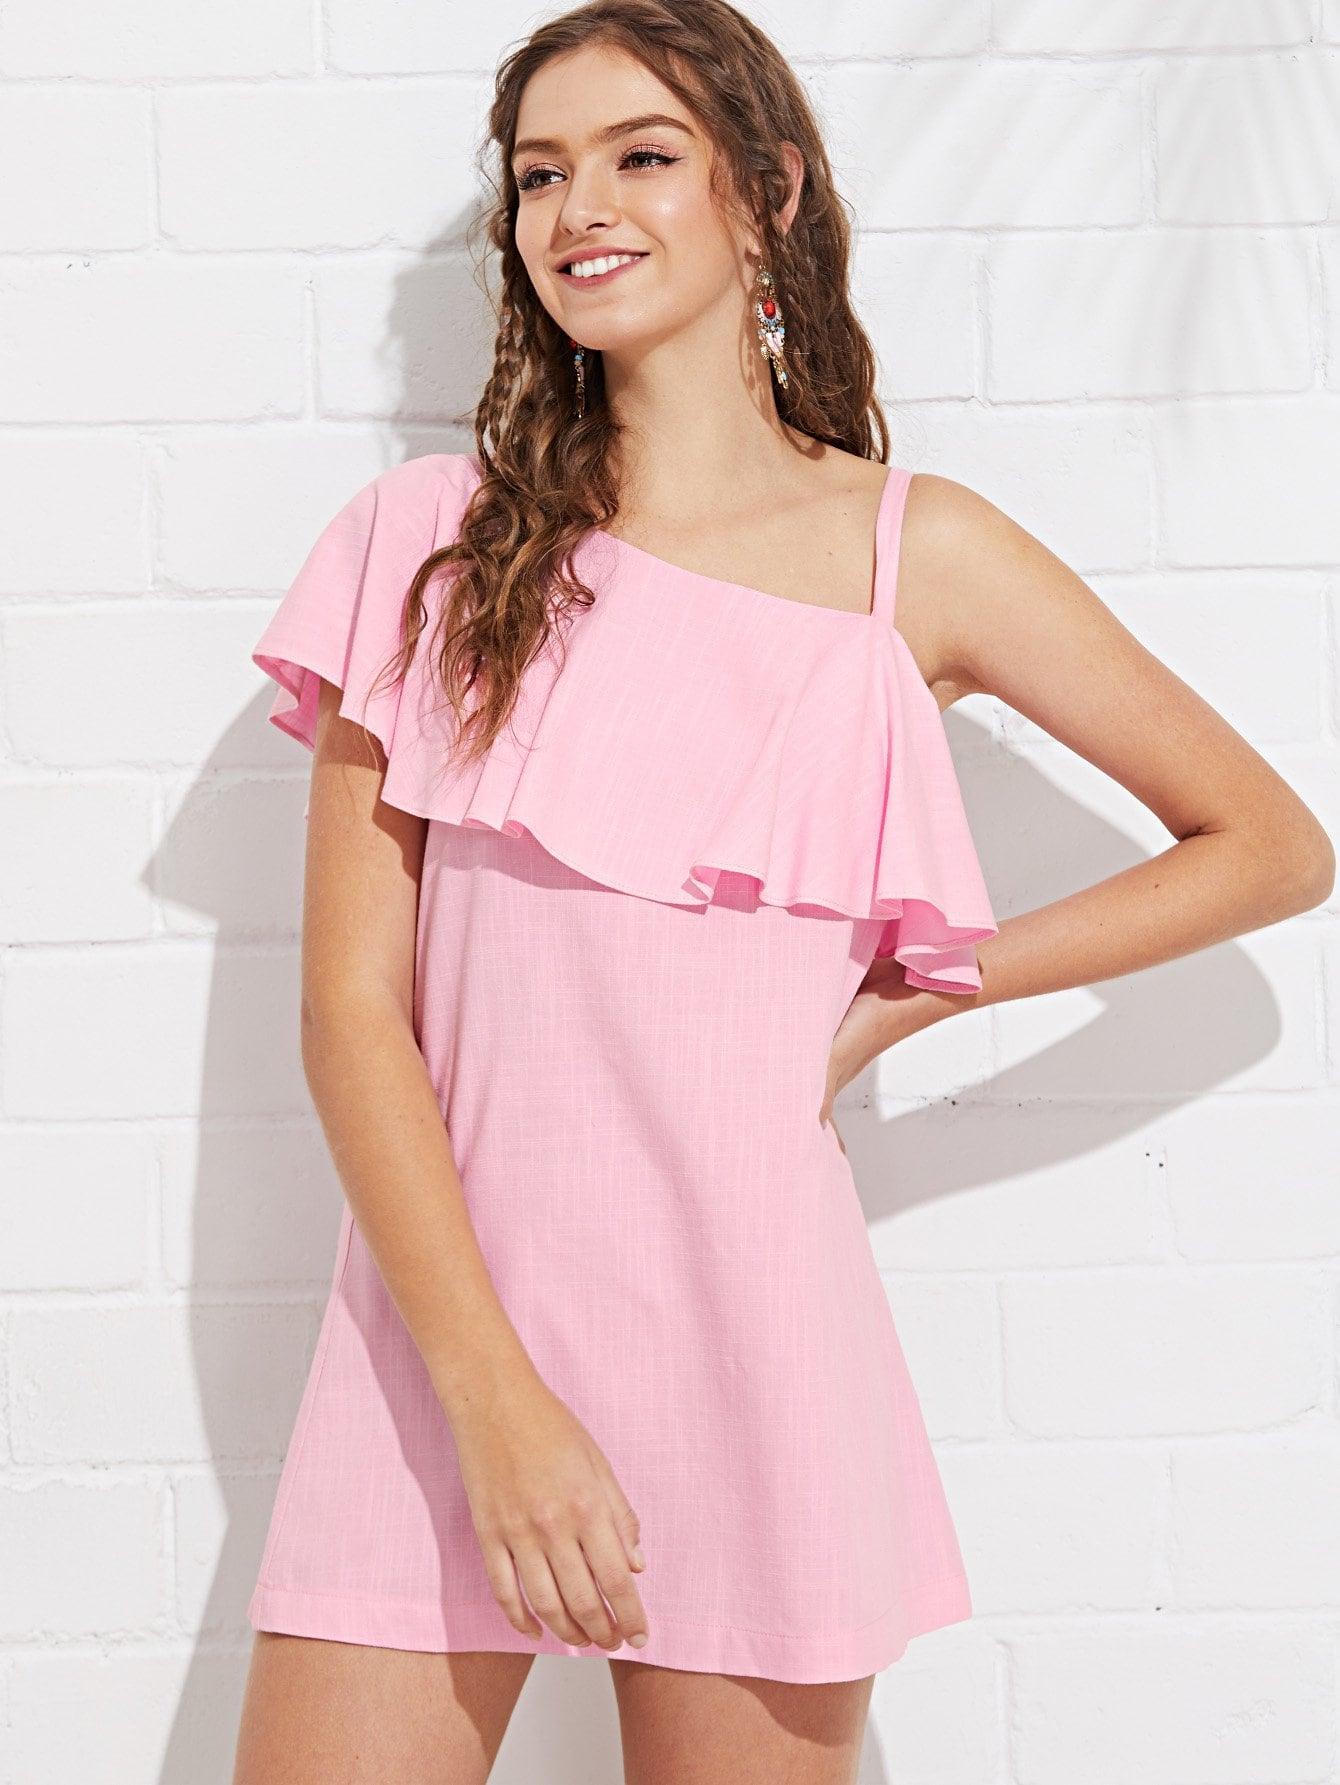 Ruffle Embellished One Shoulder Dress one shoulder ruffle embellished dress